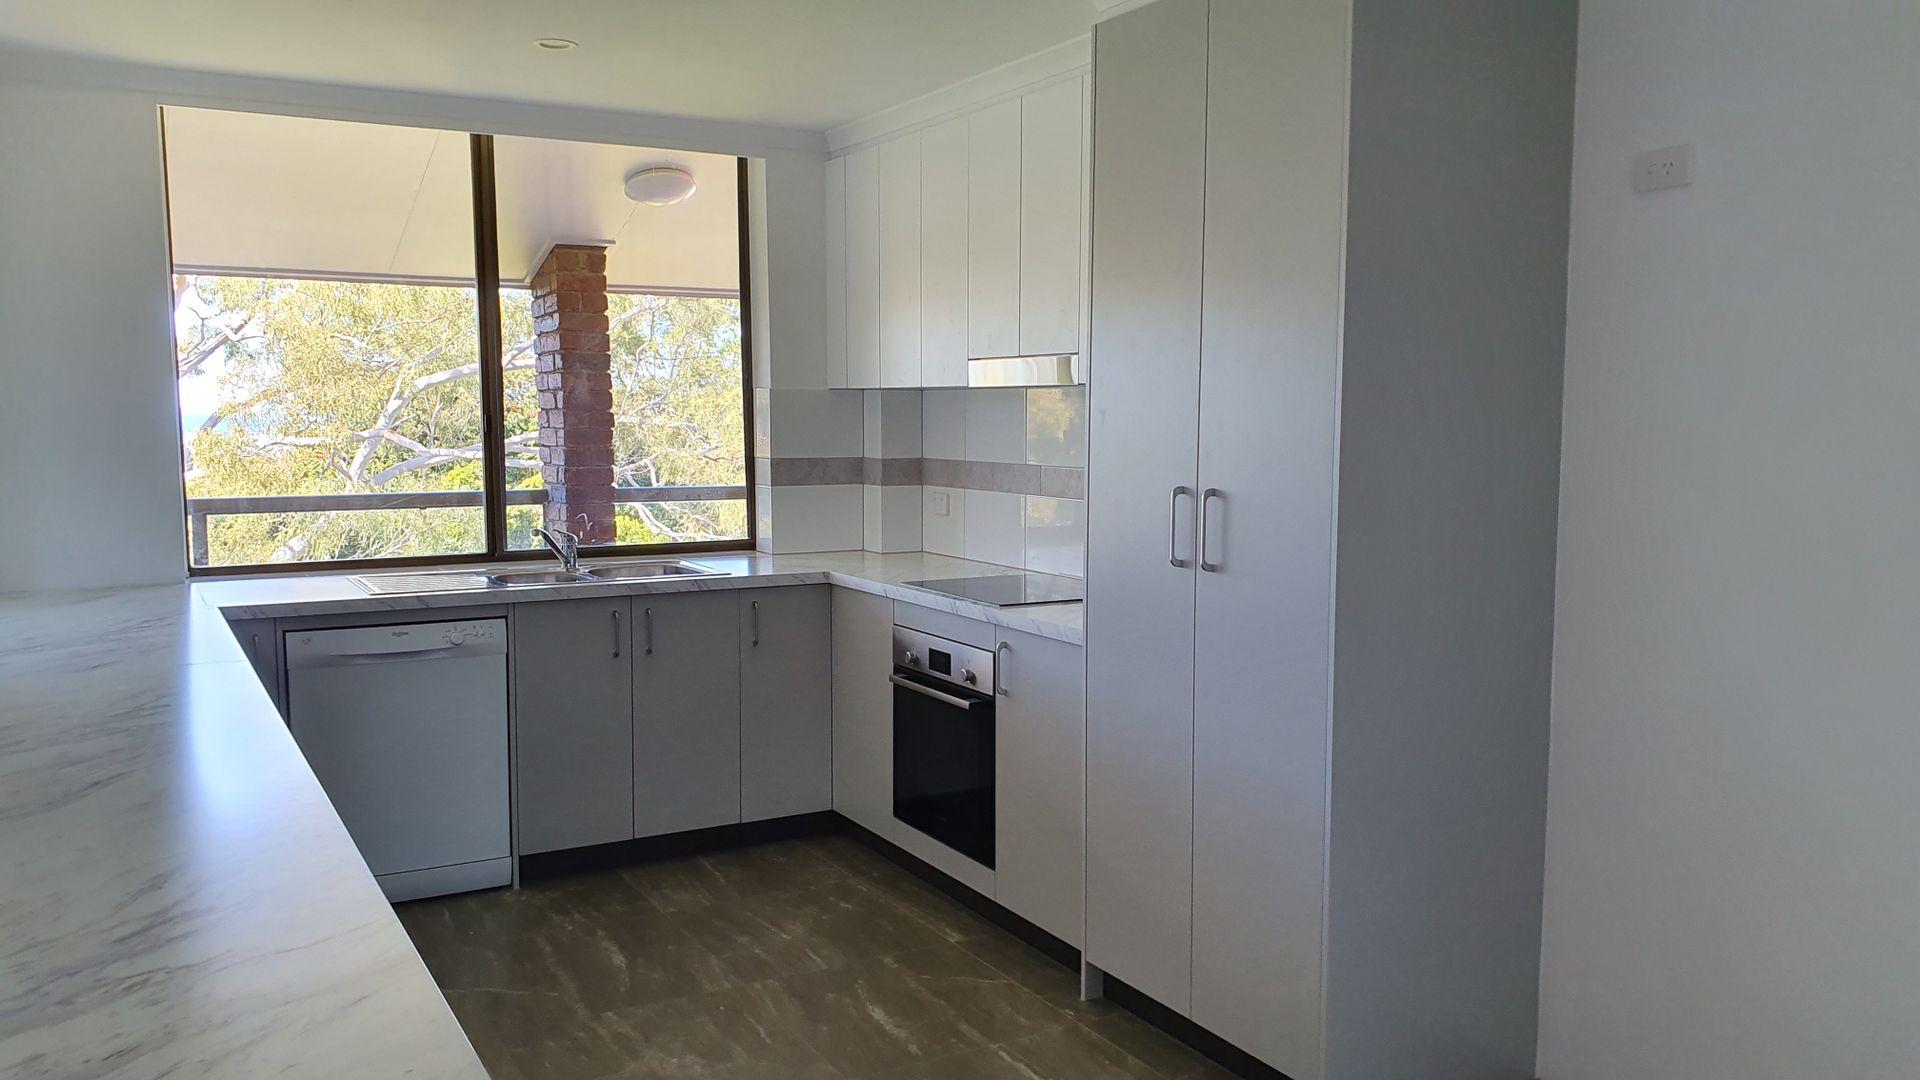 7/170 Mooloolaba Road, Buderim QLD 4556, Image 1